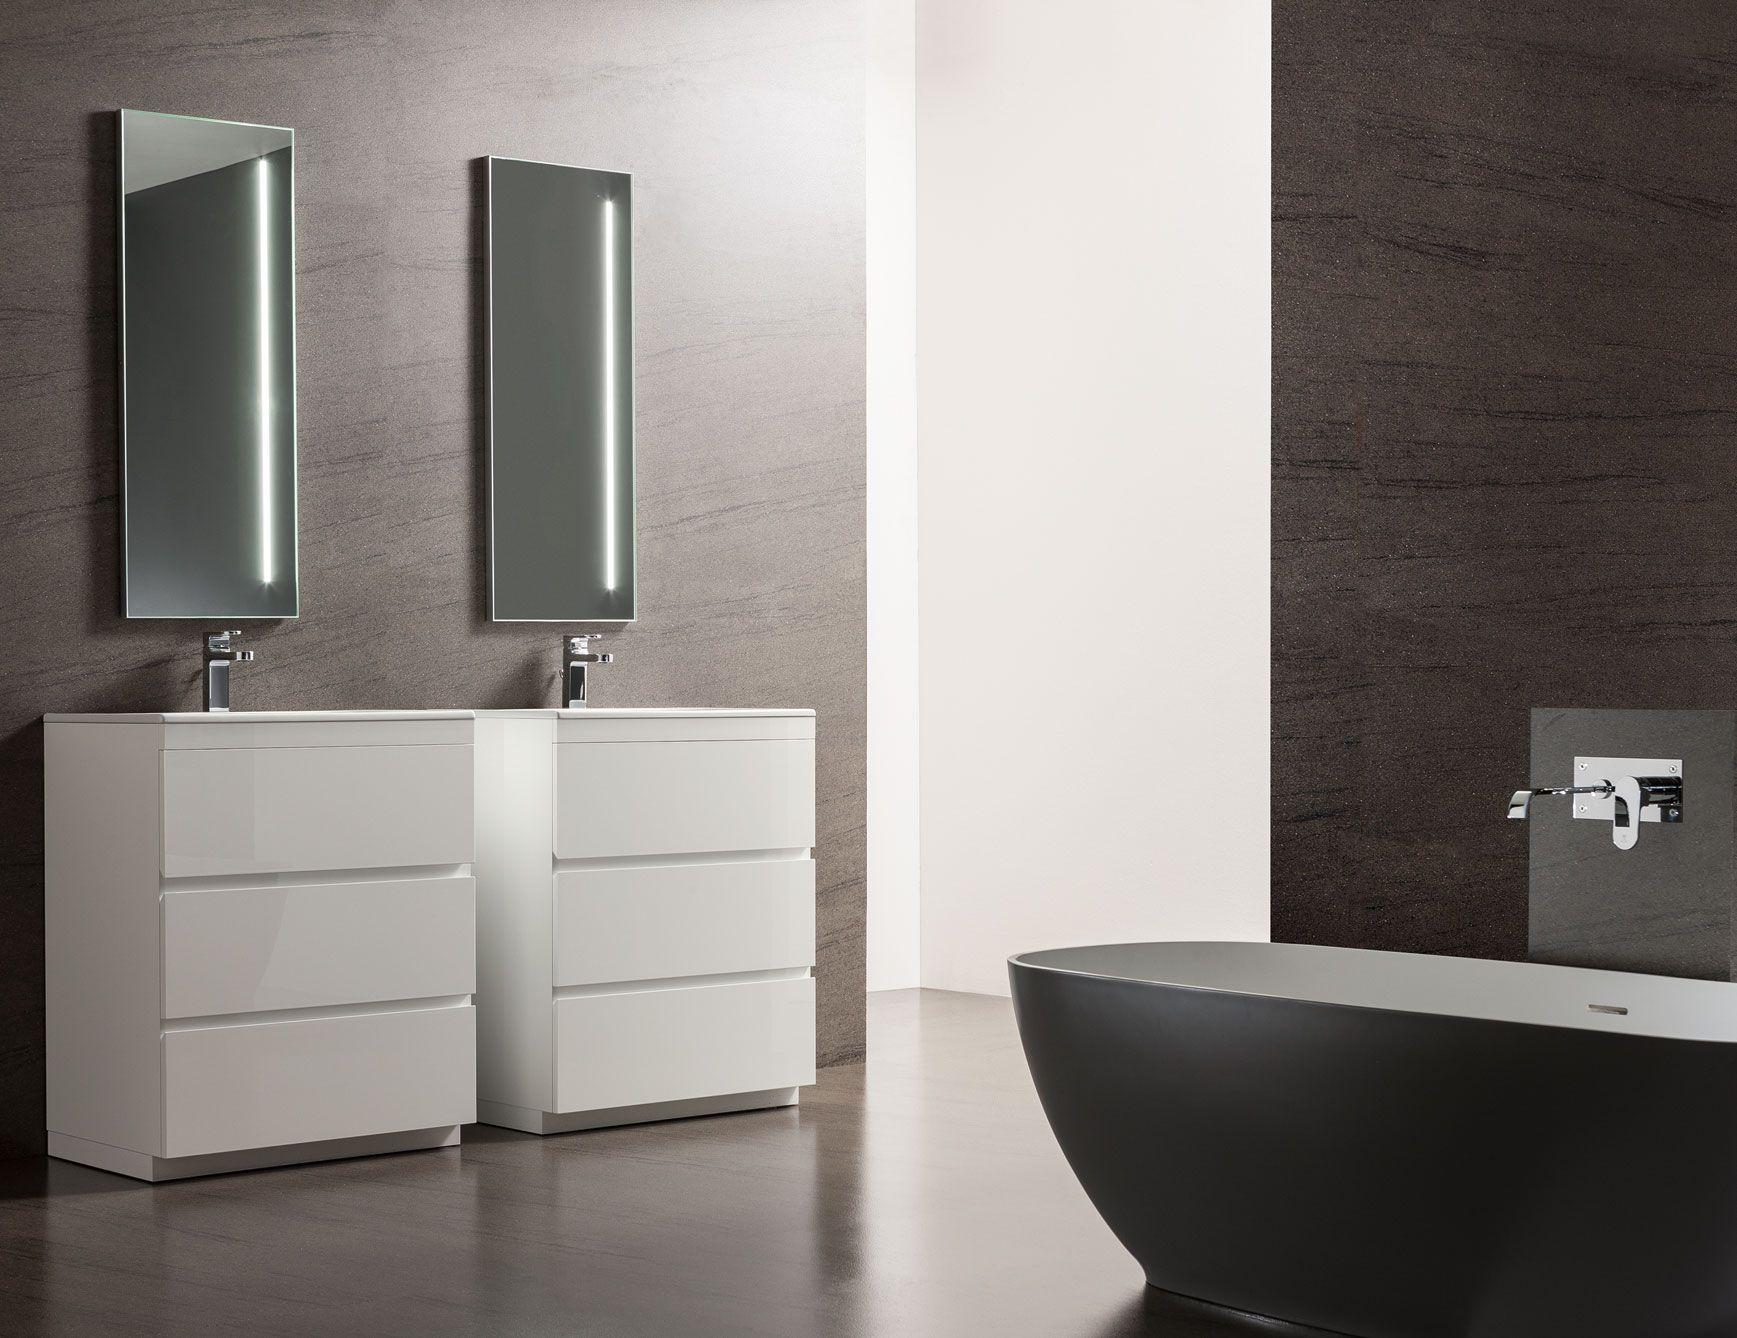 Bathroom Vanities - Passepartout | Bagni mobili | Pinterest ...